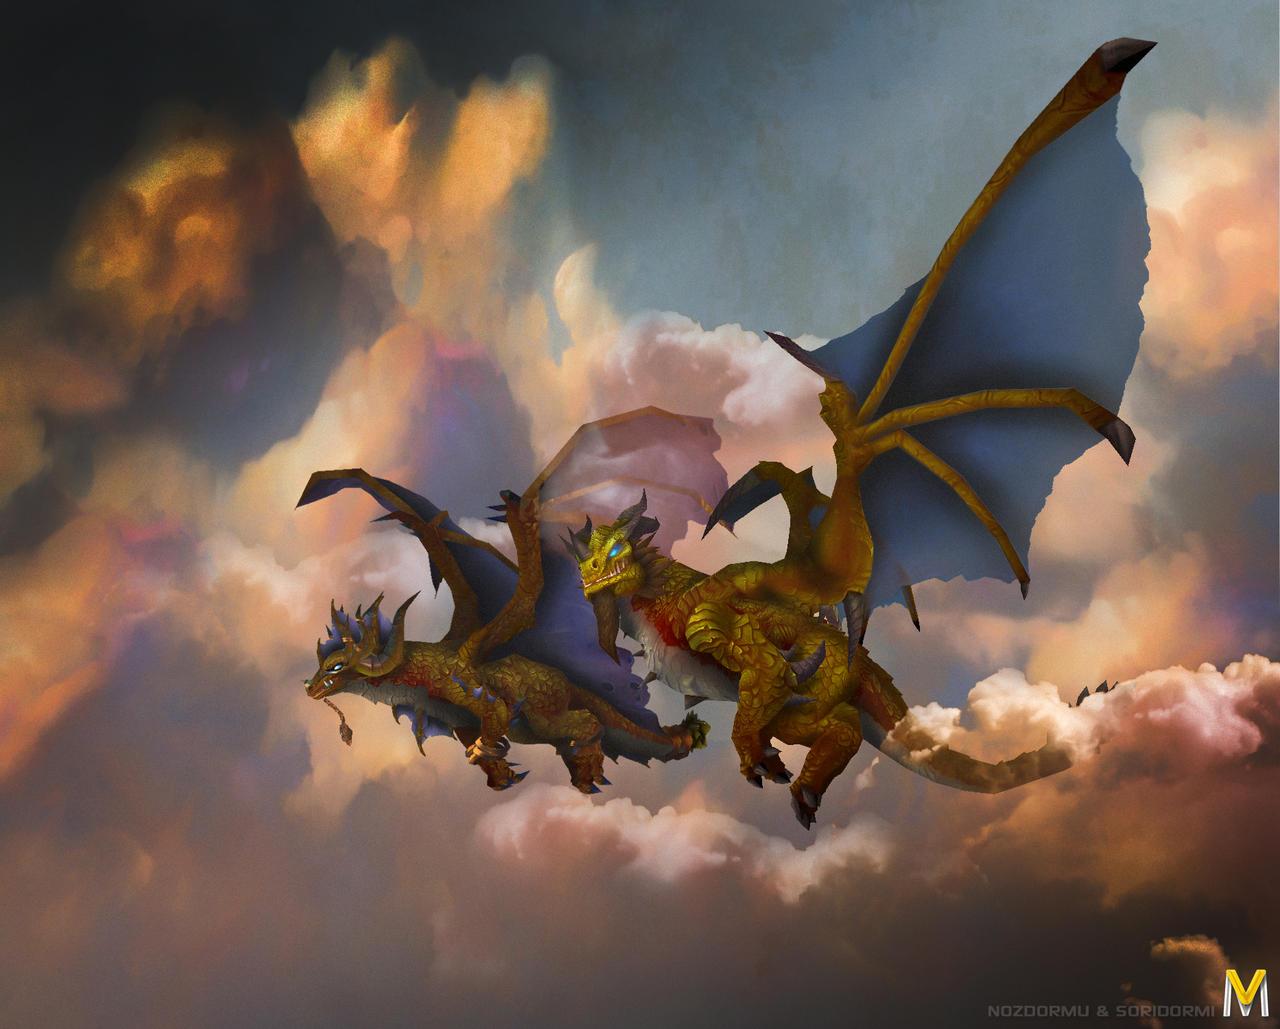 Nozdormu and Soridormi Dragon by Vaanel